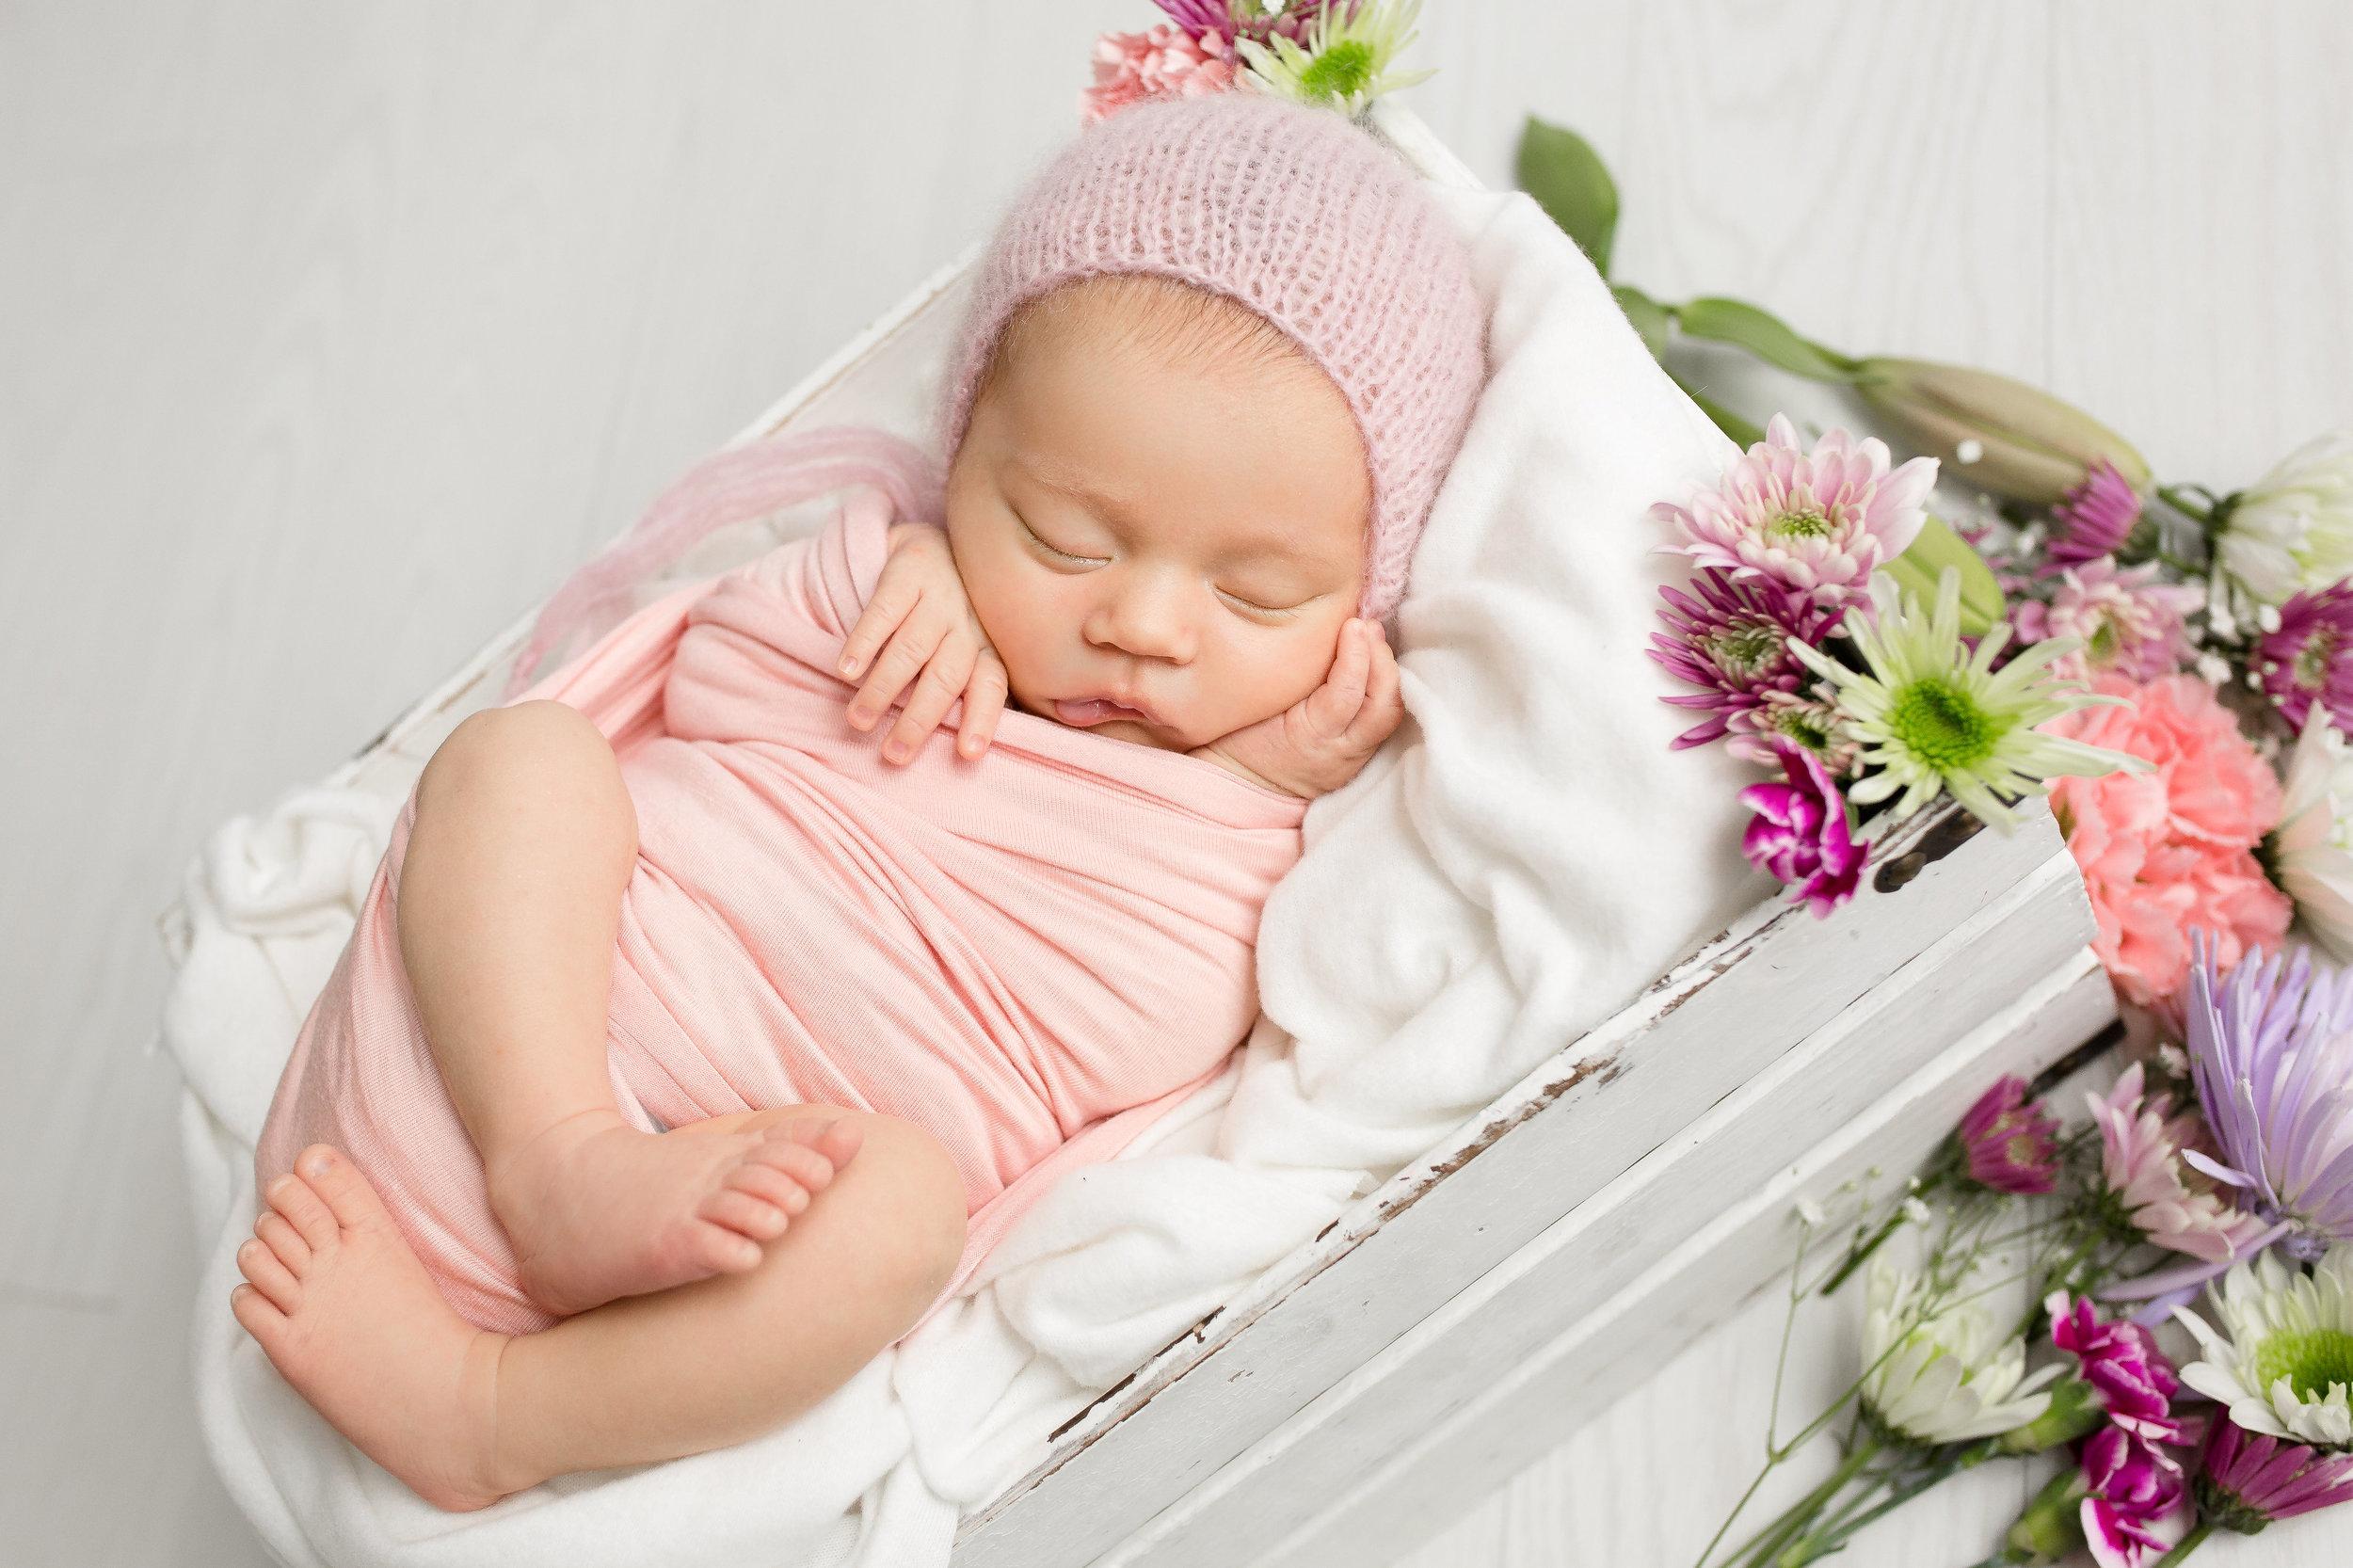 floral-newborn-photo-columbus-ohio-newborn-photographer